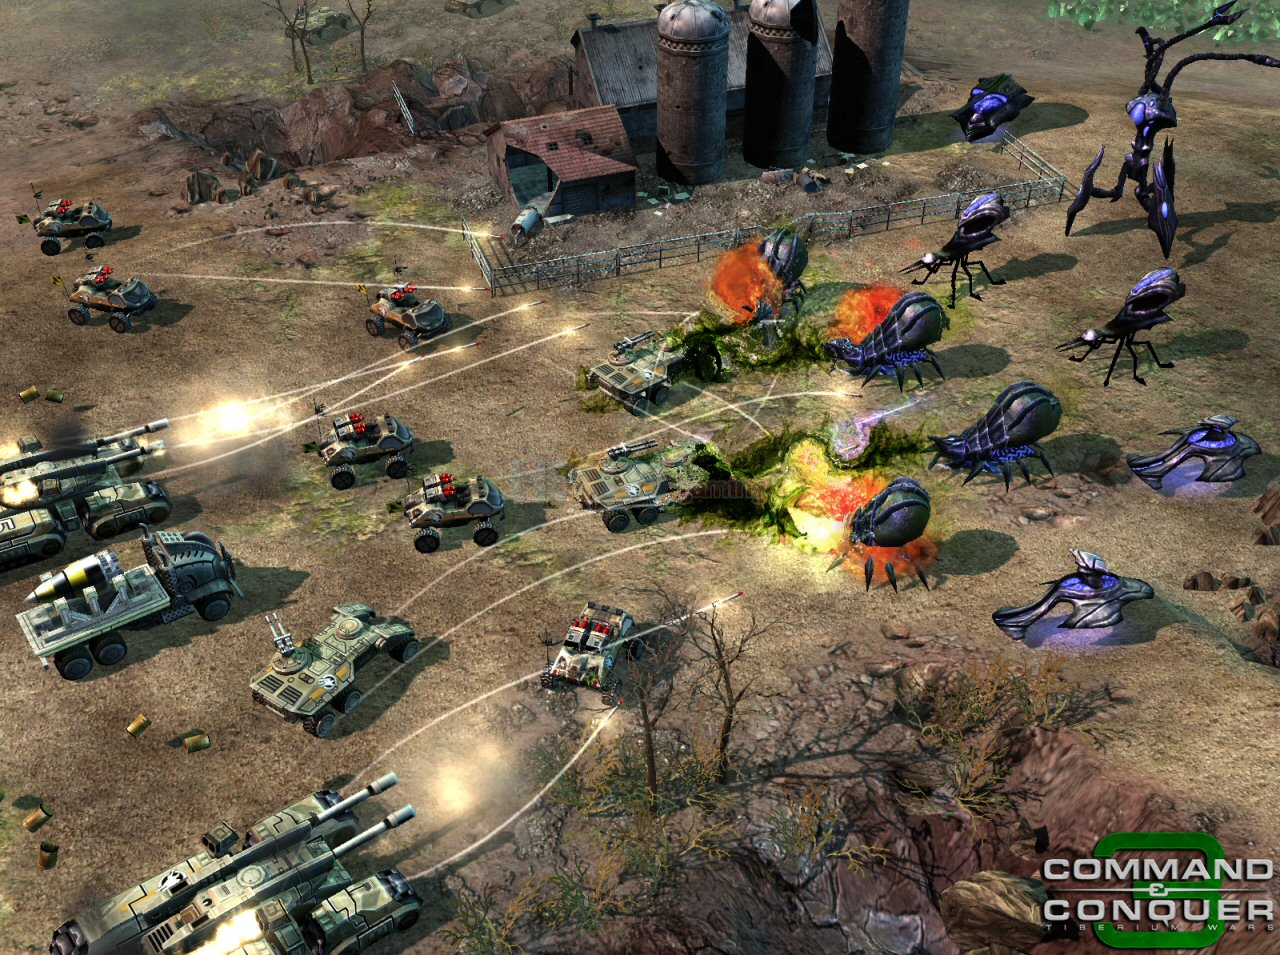 Command And Conquer 3 Tiberium Wars Demo